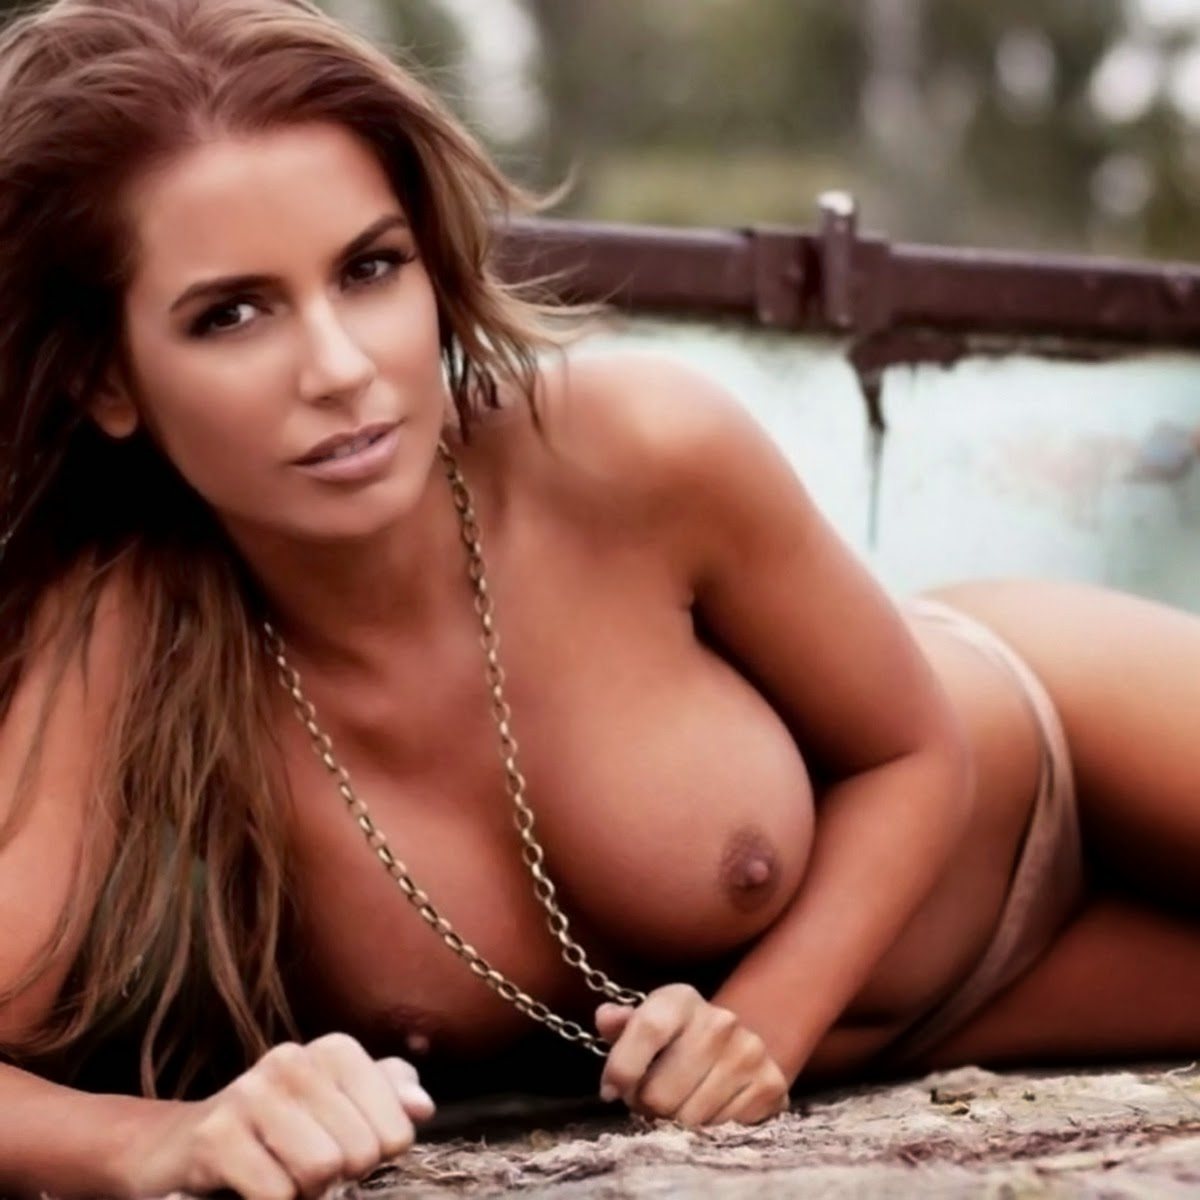 samantha hoopes nude   hot girls wallpaper